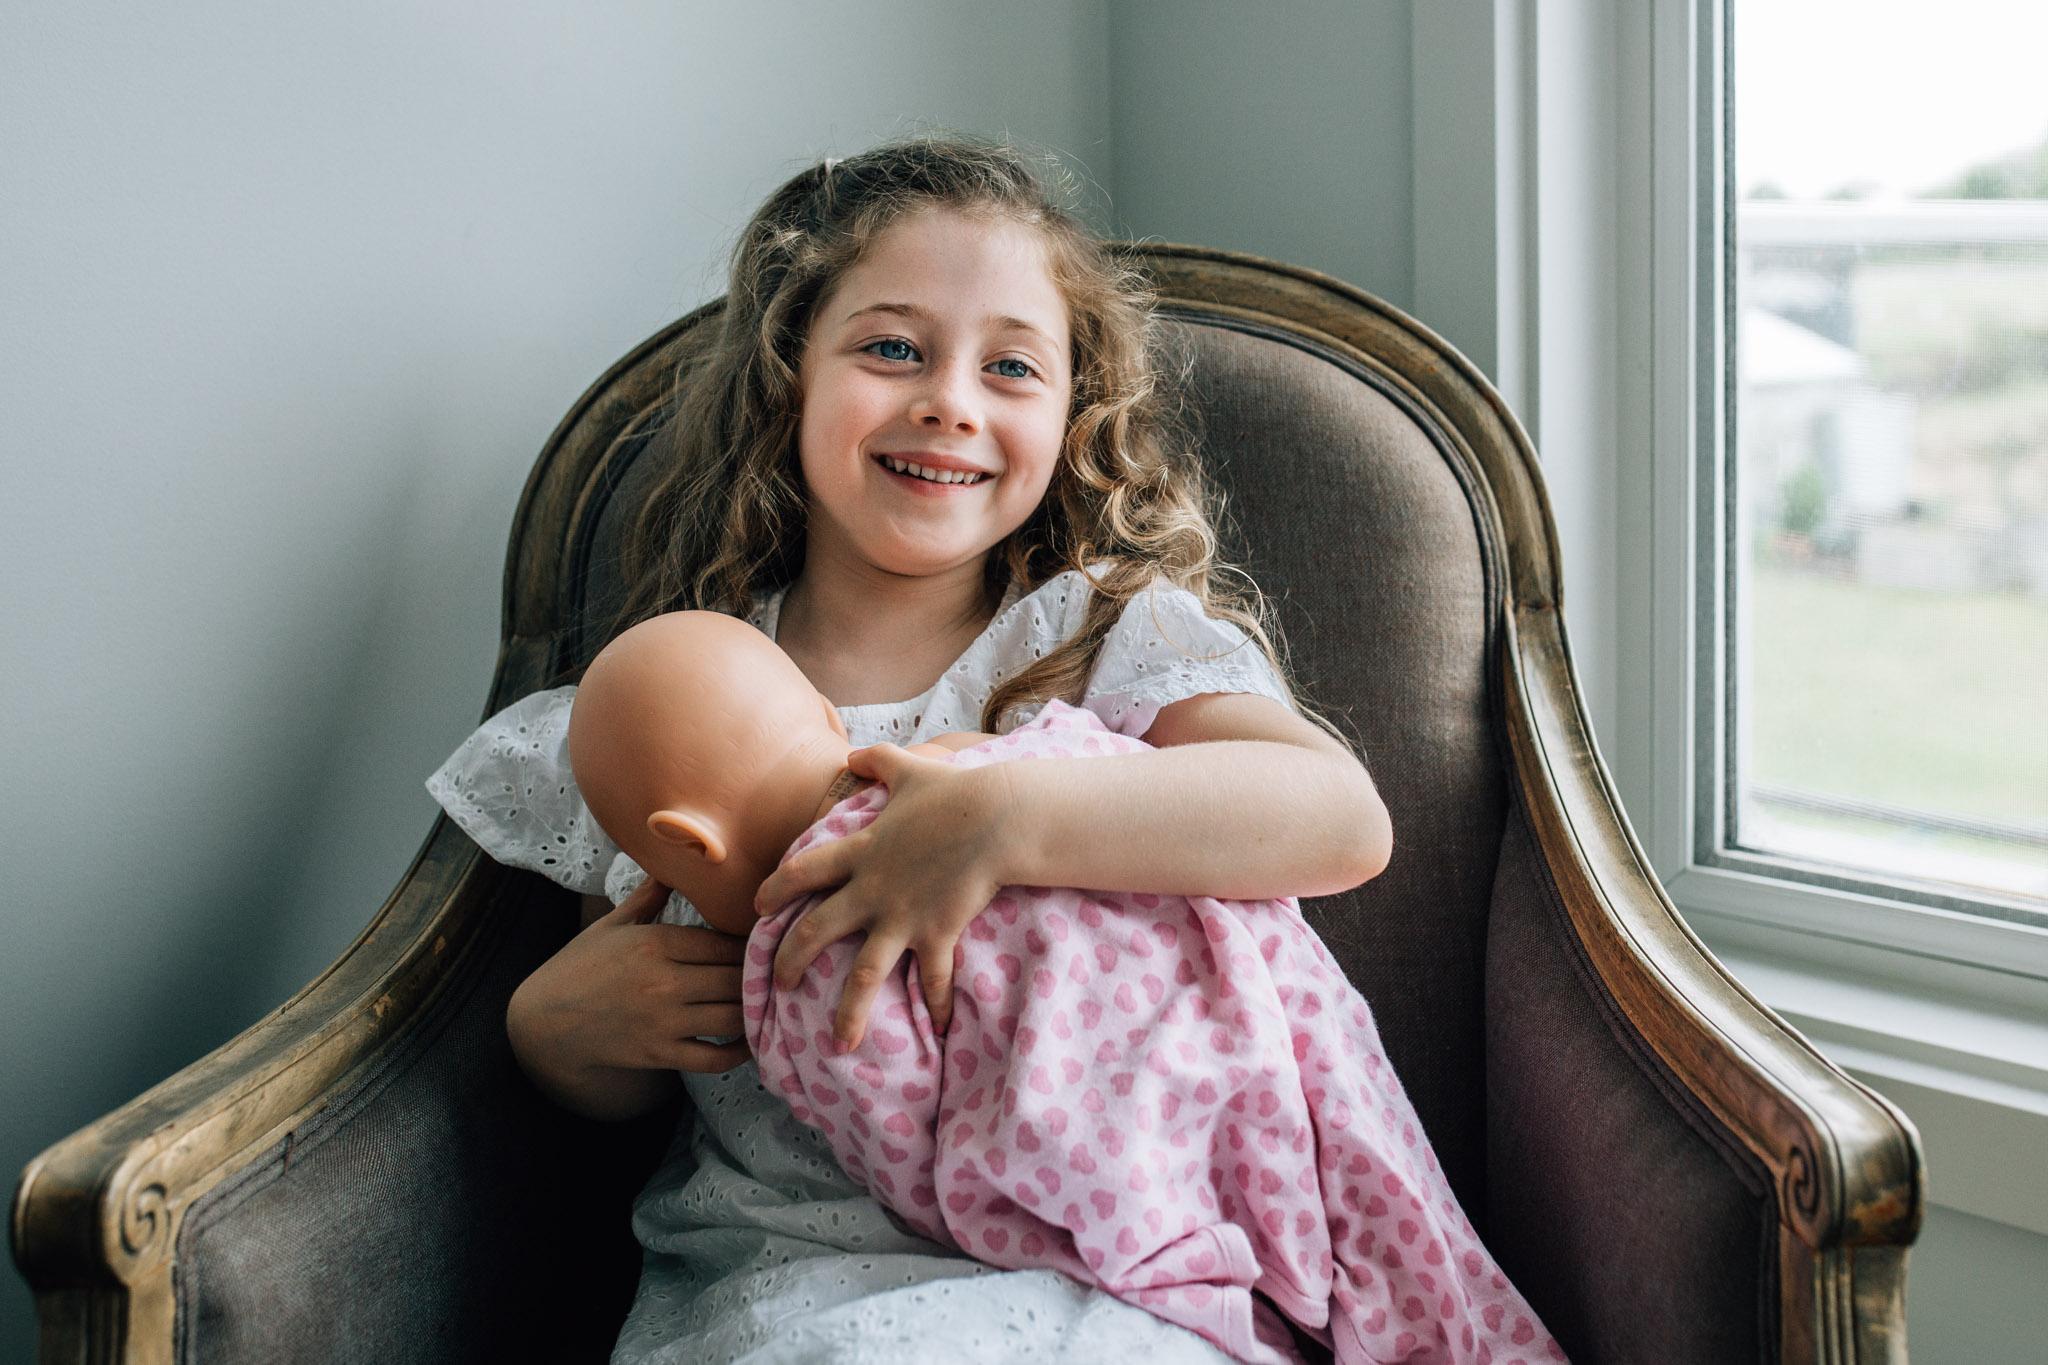 little-girl-pretending-to-breastfeed-baby-doll (1 of 1).jpg